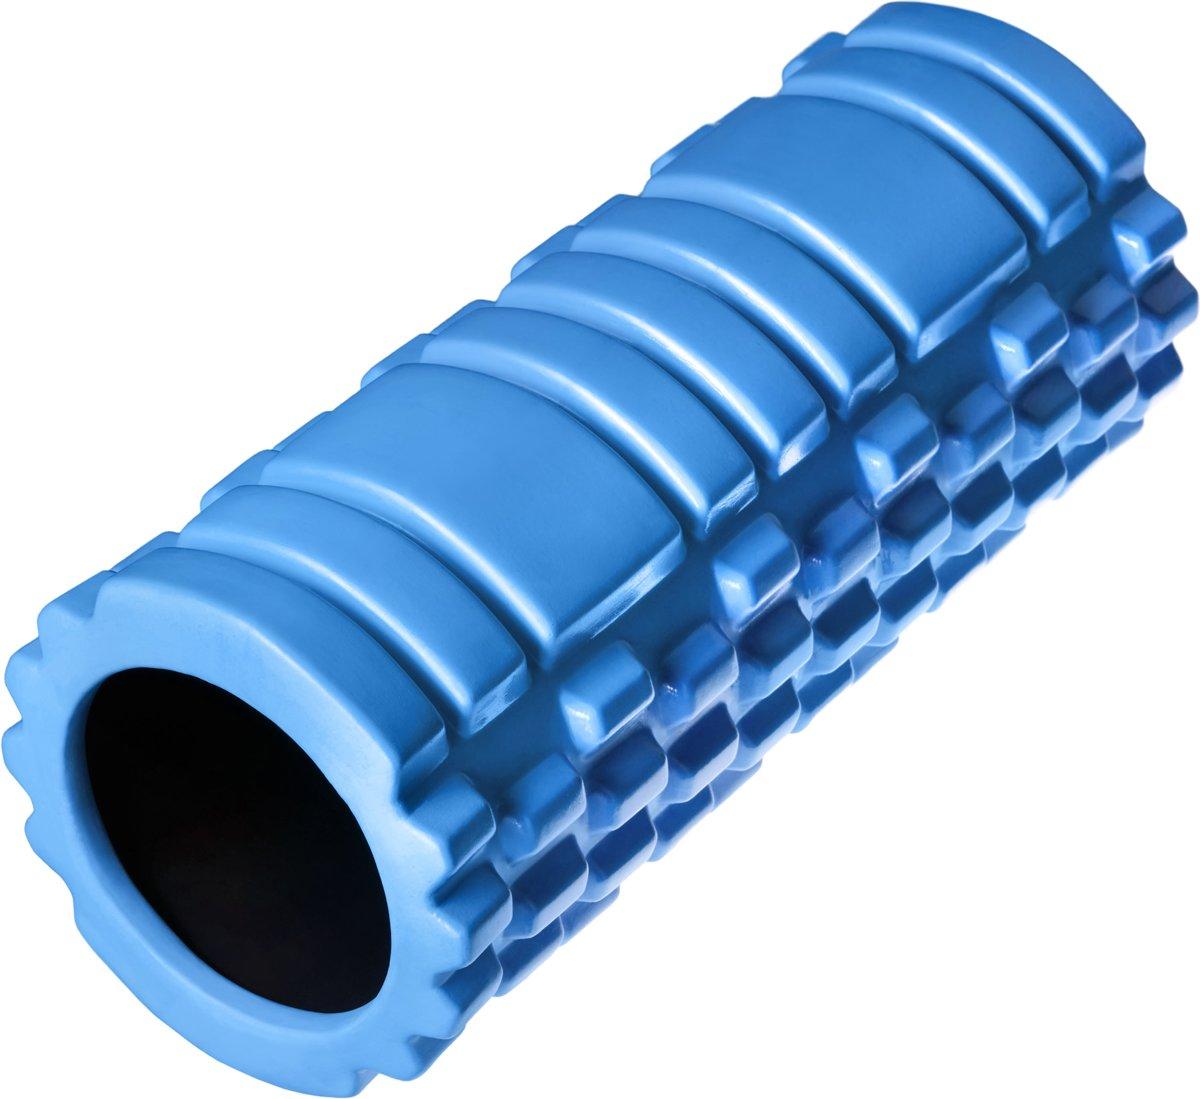 TecTake -  Yoga massagerol foamroller blauw - 402843 kopen